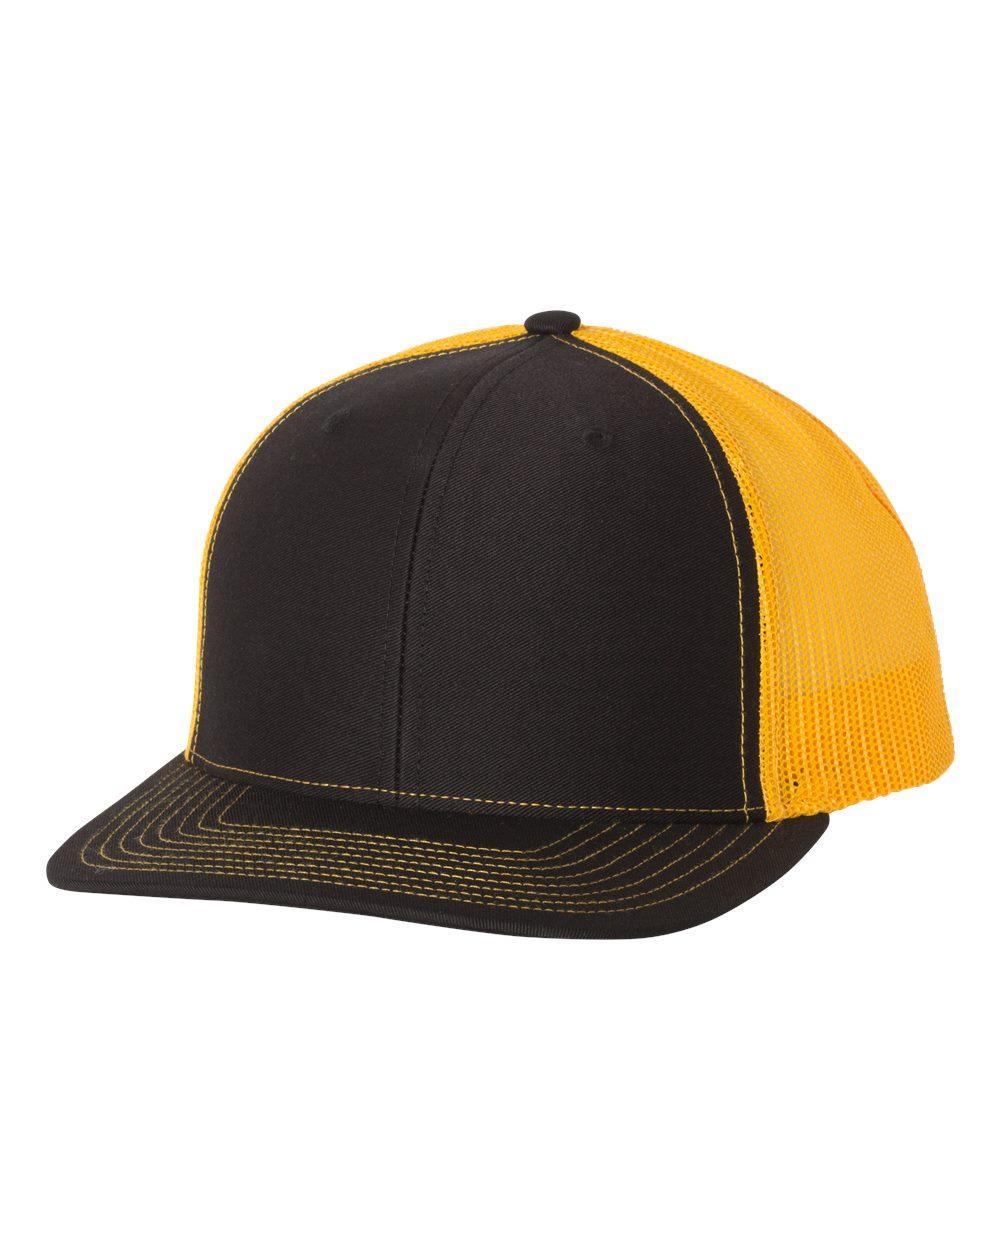 25 Richardson Trucker Snapback Cap 112 Baseball Hat 57 Colors!!!